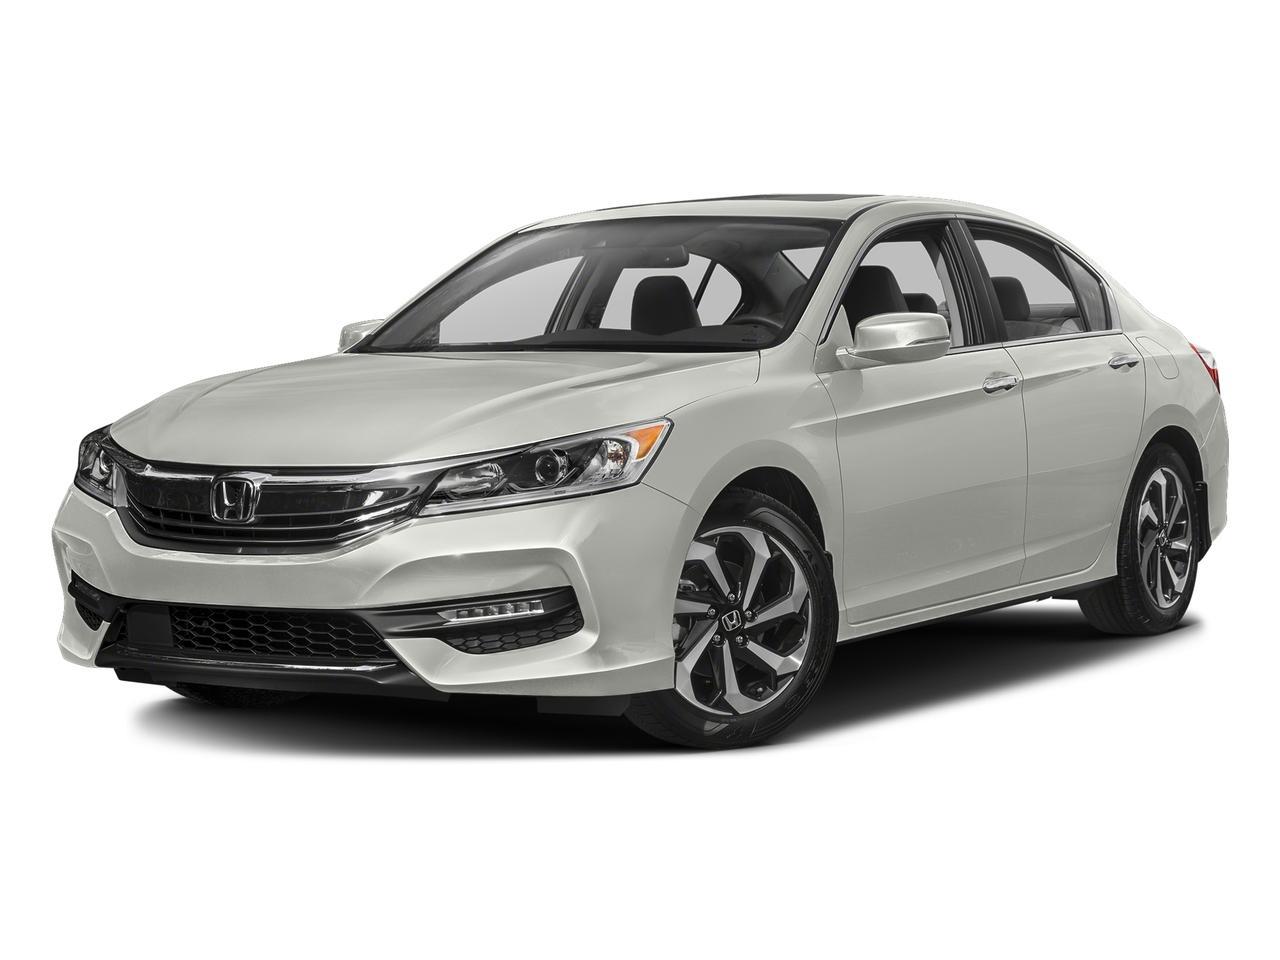 2016 Honda Accord Sedan Vehicle Photo in Elkhorn, WI 53121